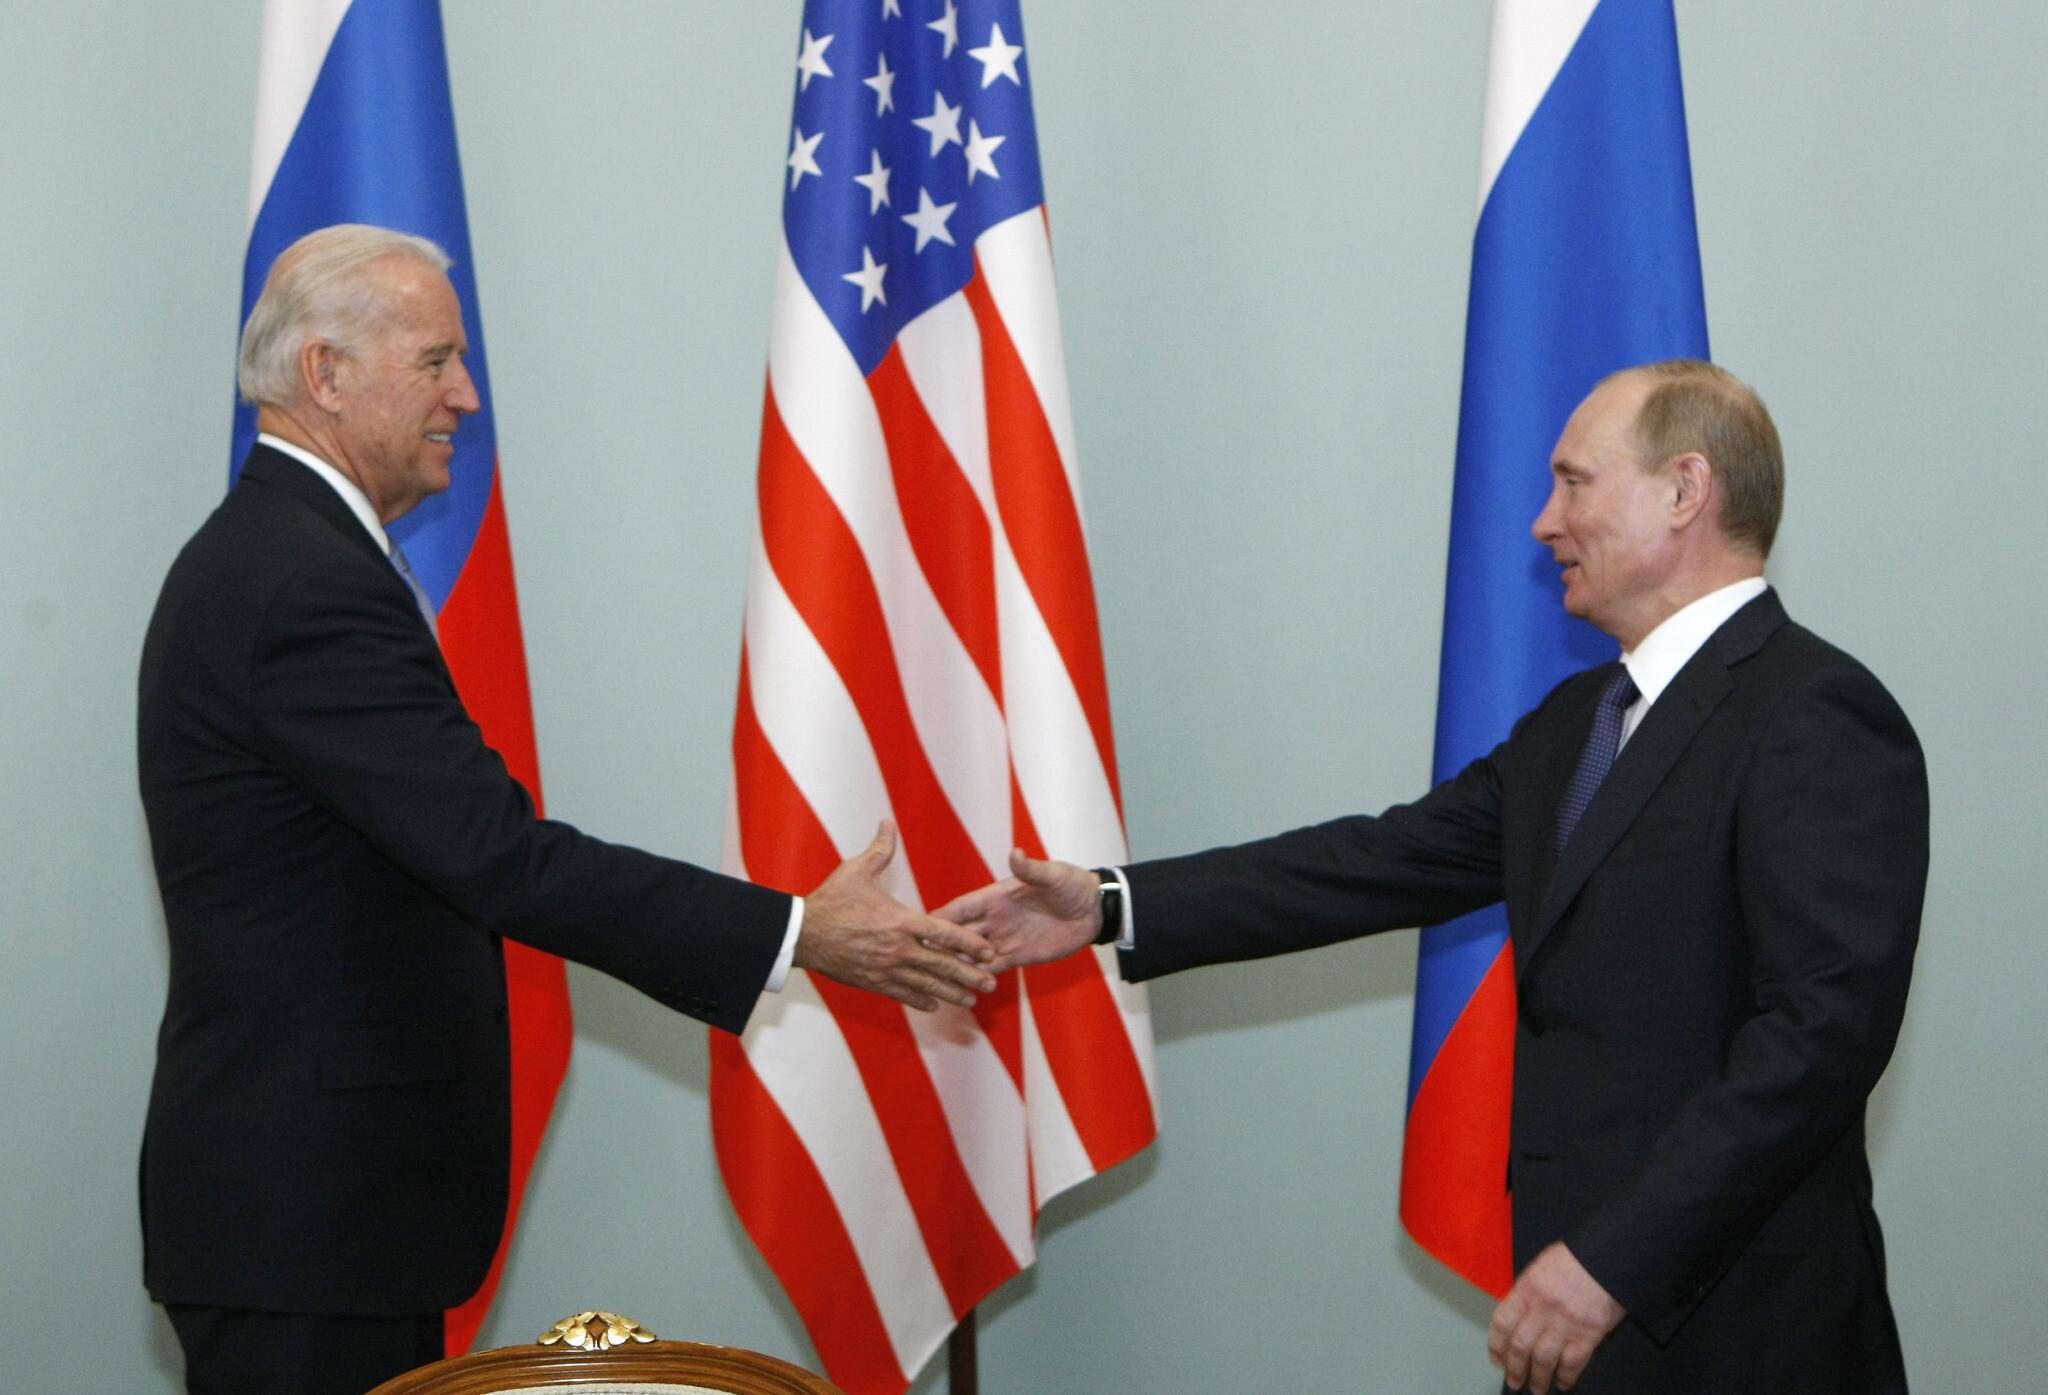 U.S. election: Why President Putin has not congratulated Joe Biden - Russia